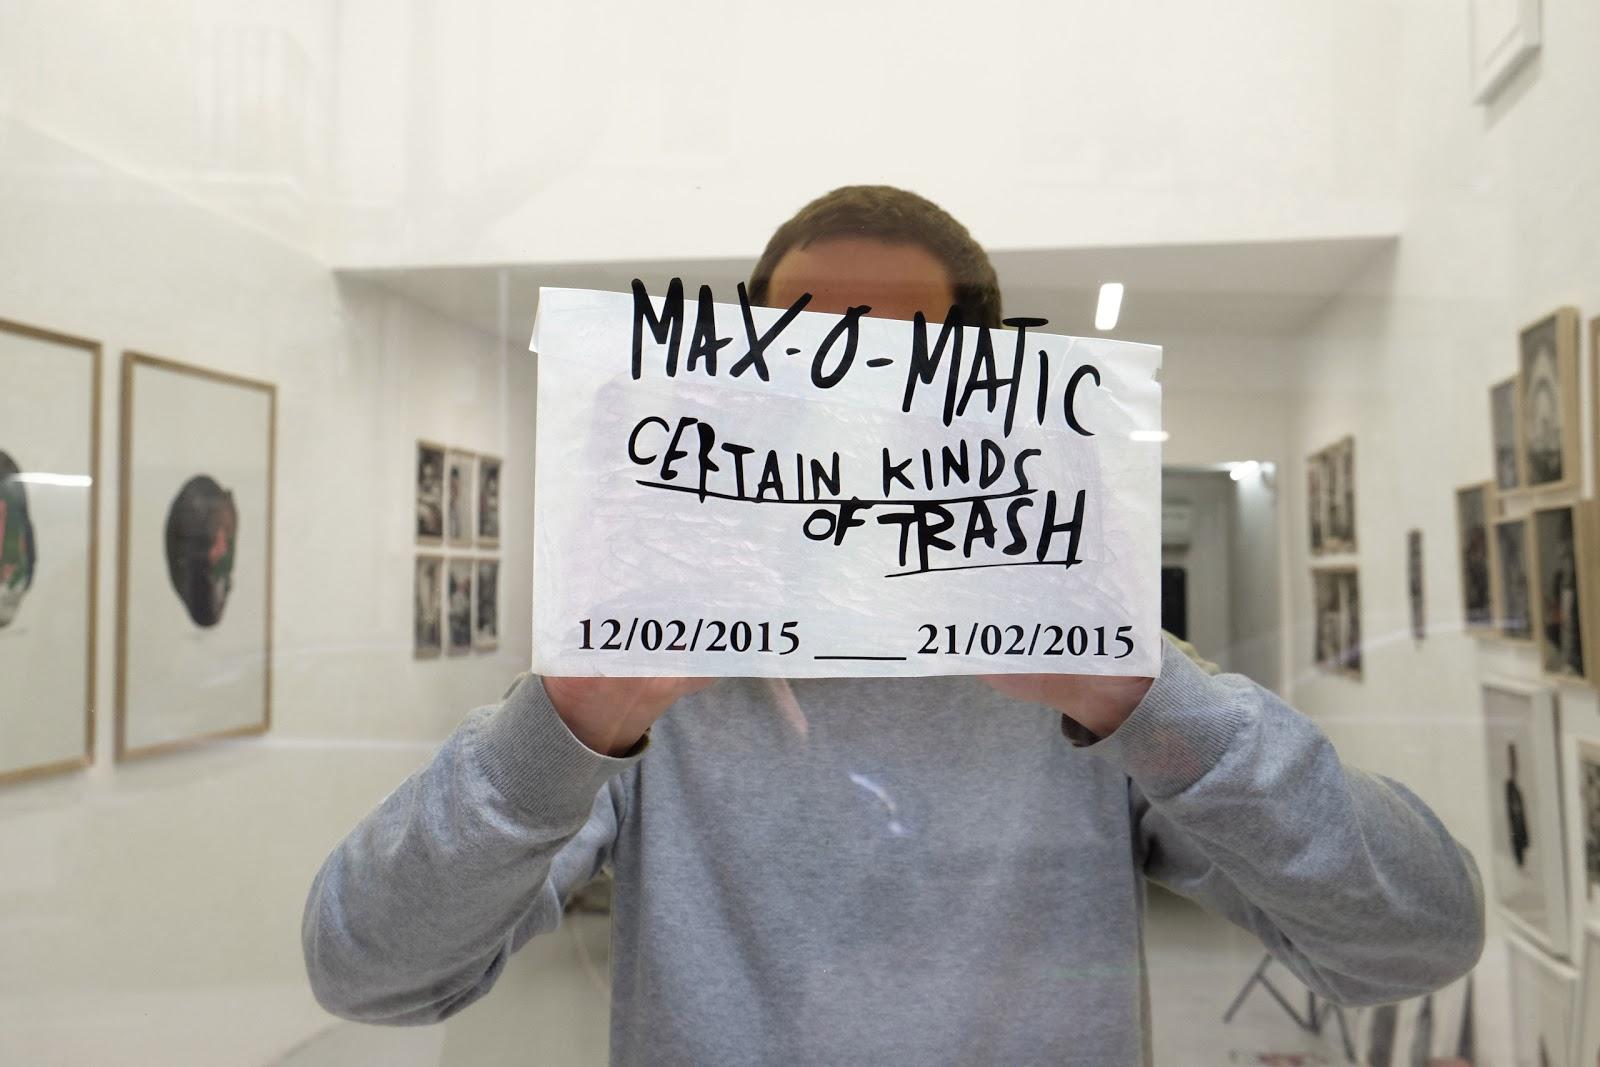 Max-o-matic: Certain kinds of trash.